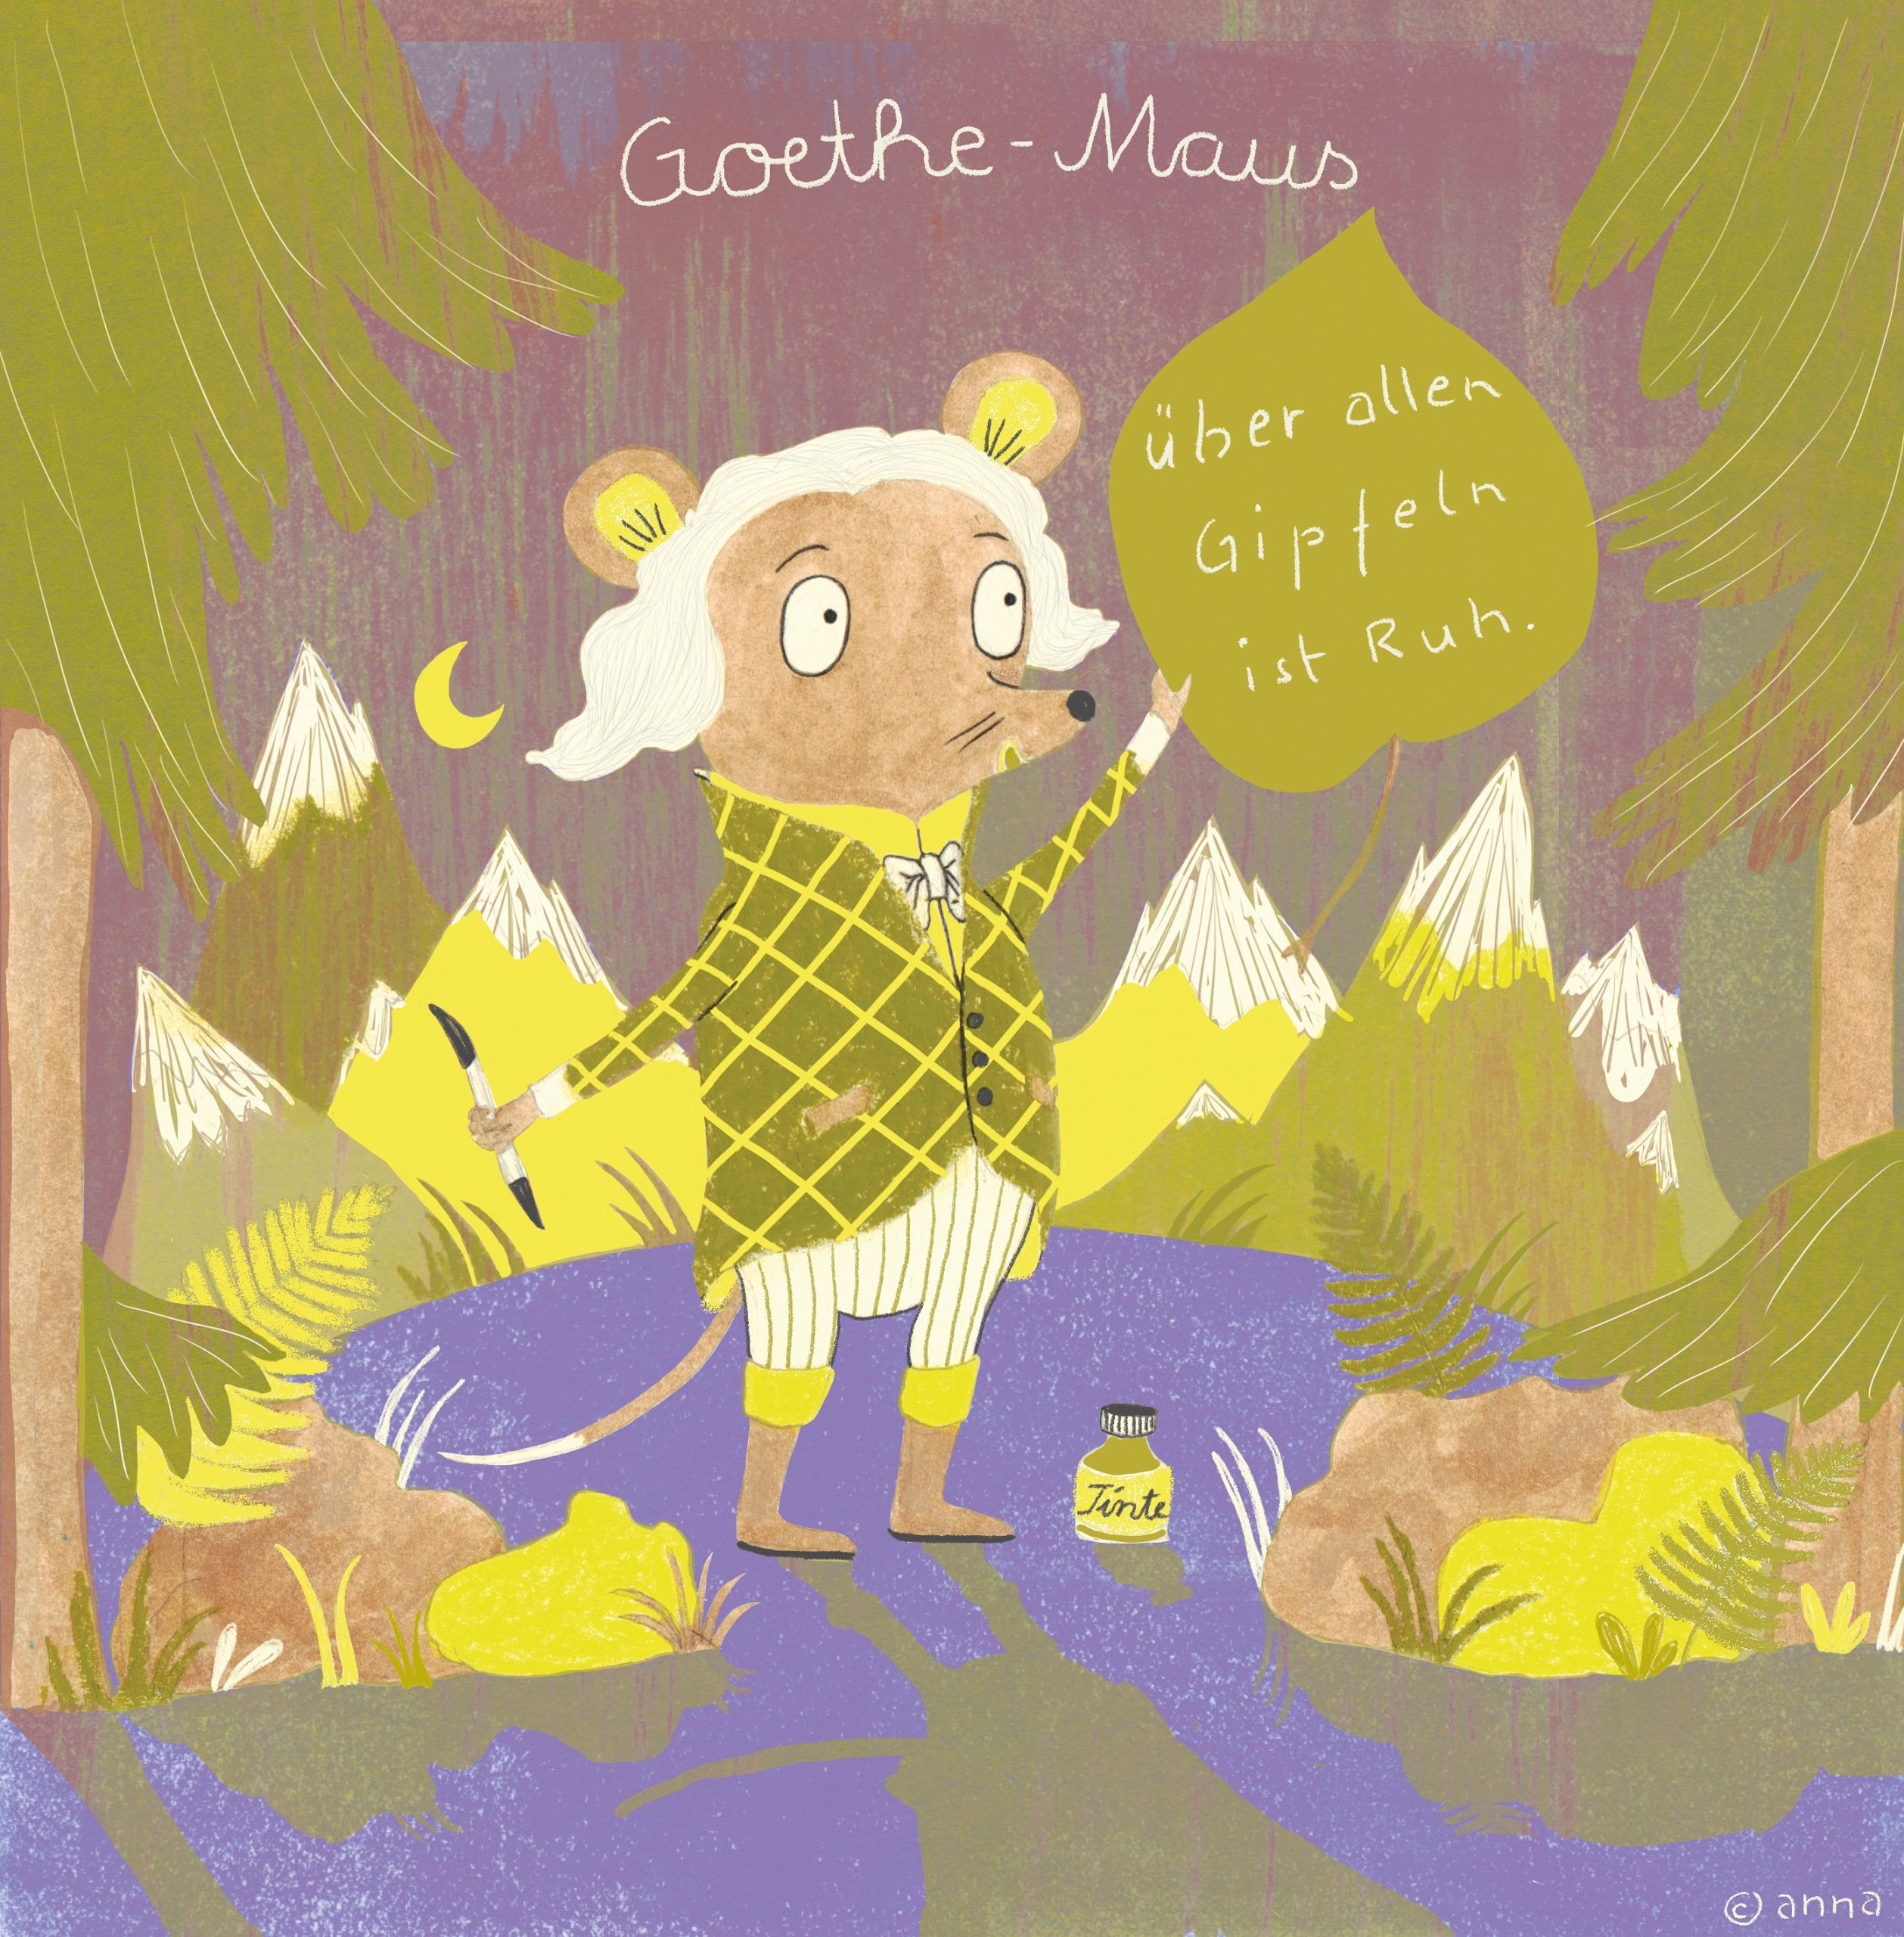 Goethe-Maus